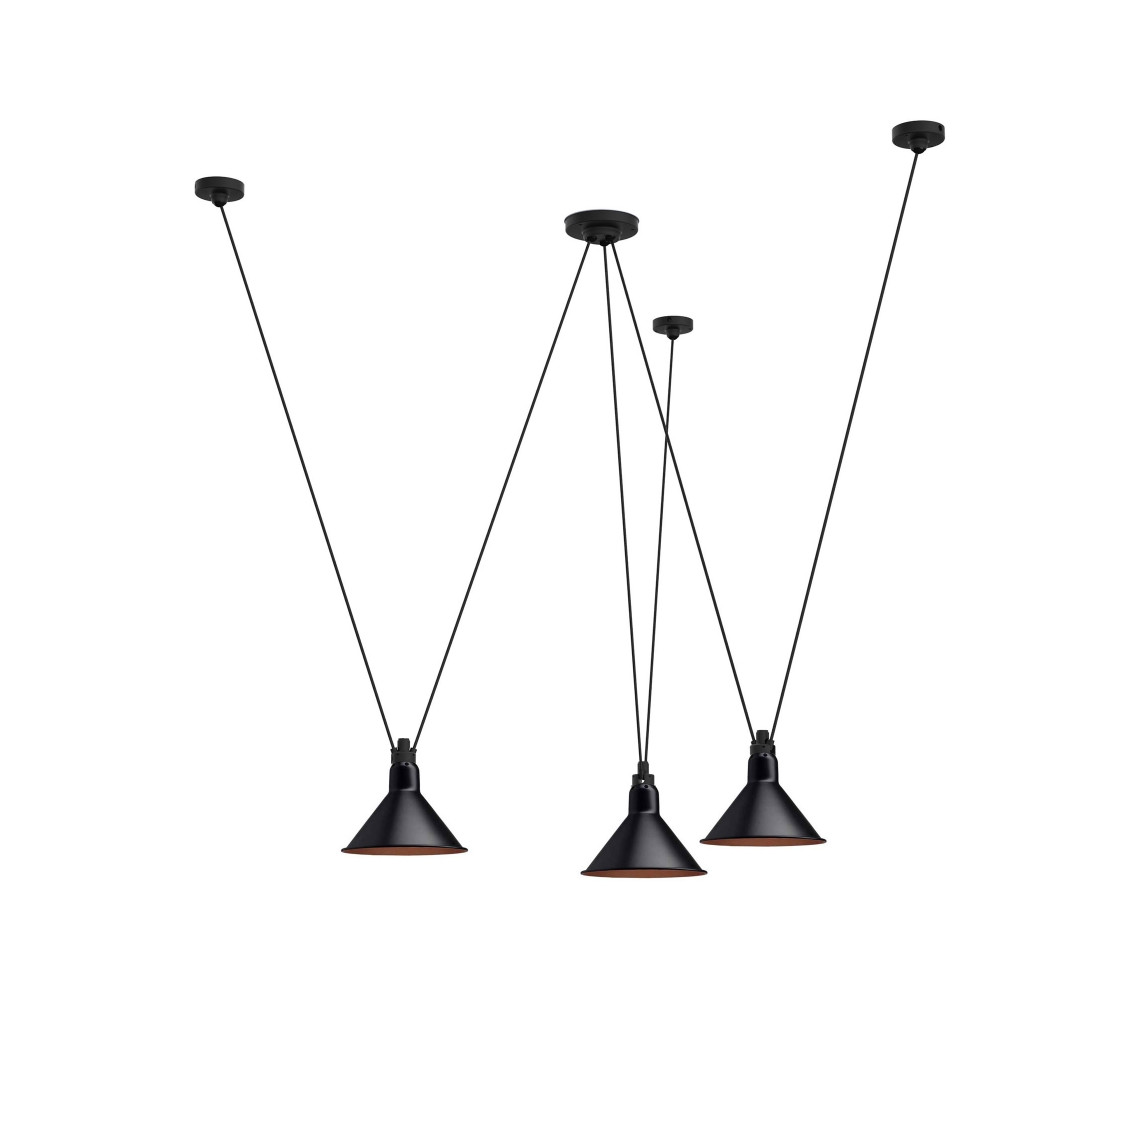 Les Acrobates de Gras No 325 - Conic L Black / Copper